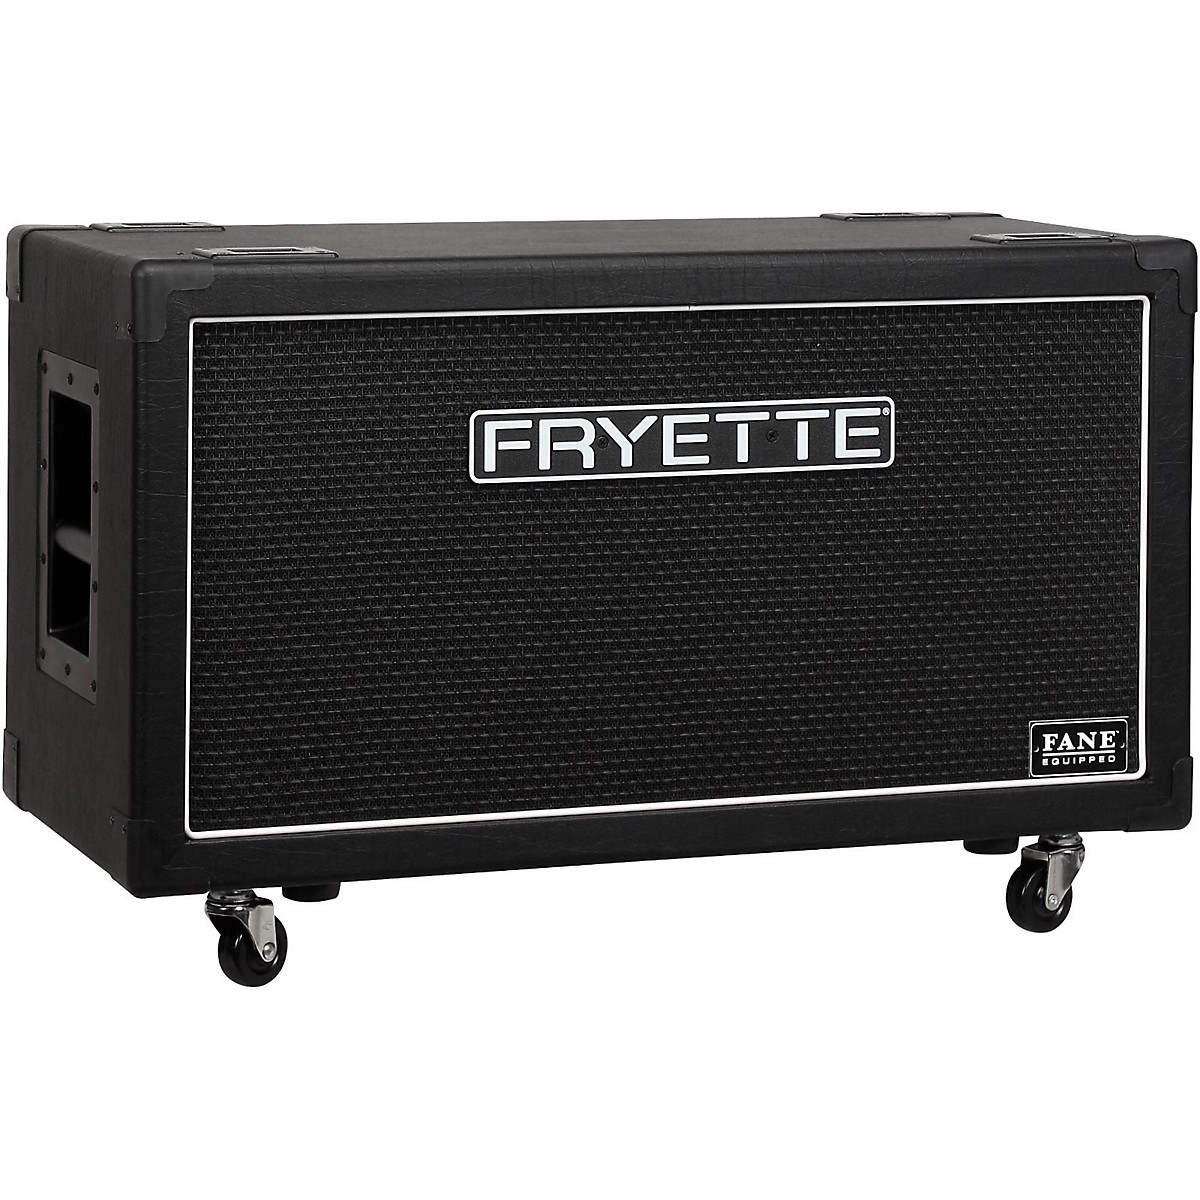 Fryette FatBottom 212 Cabinet - FANE